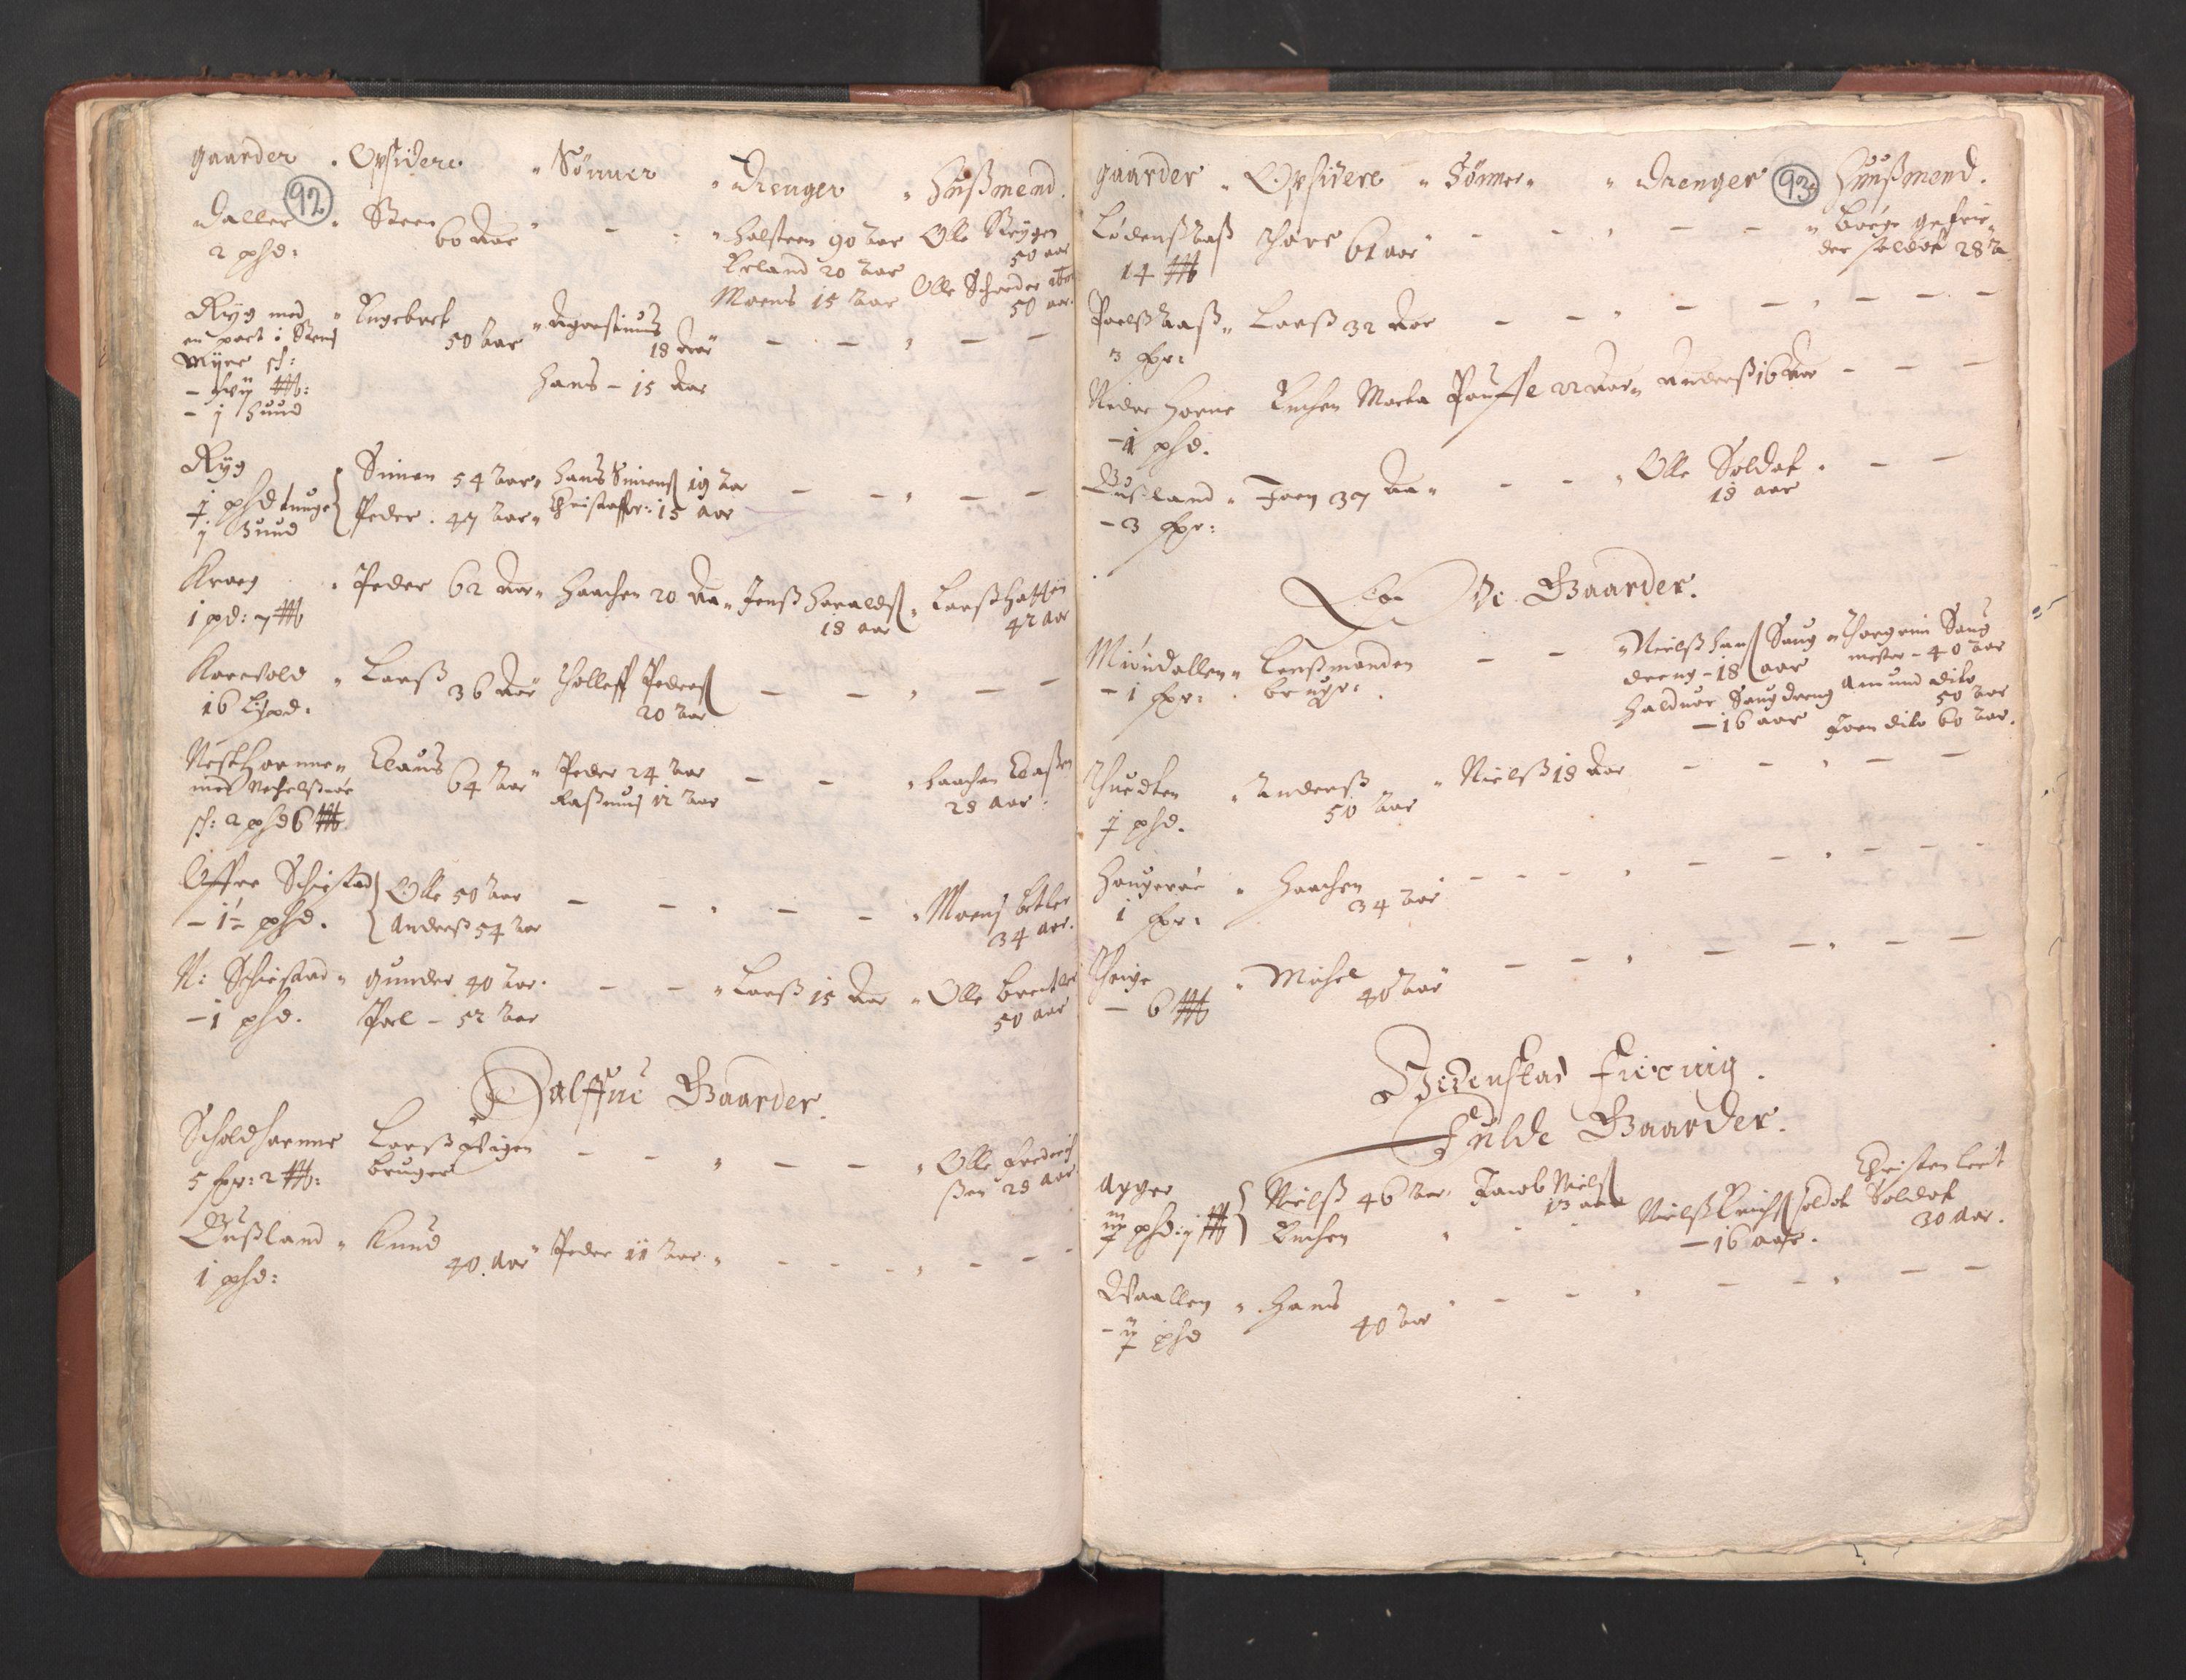 RA, Fogdenes og sorenskrivernes manntall 1664-1666, nr. 5: Fogderier (len og skipreider) i nåværende Buskerud fylke og Vestfold fylke, 1664, s. 92-93